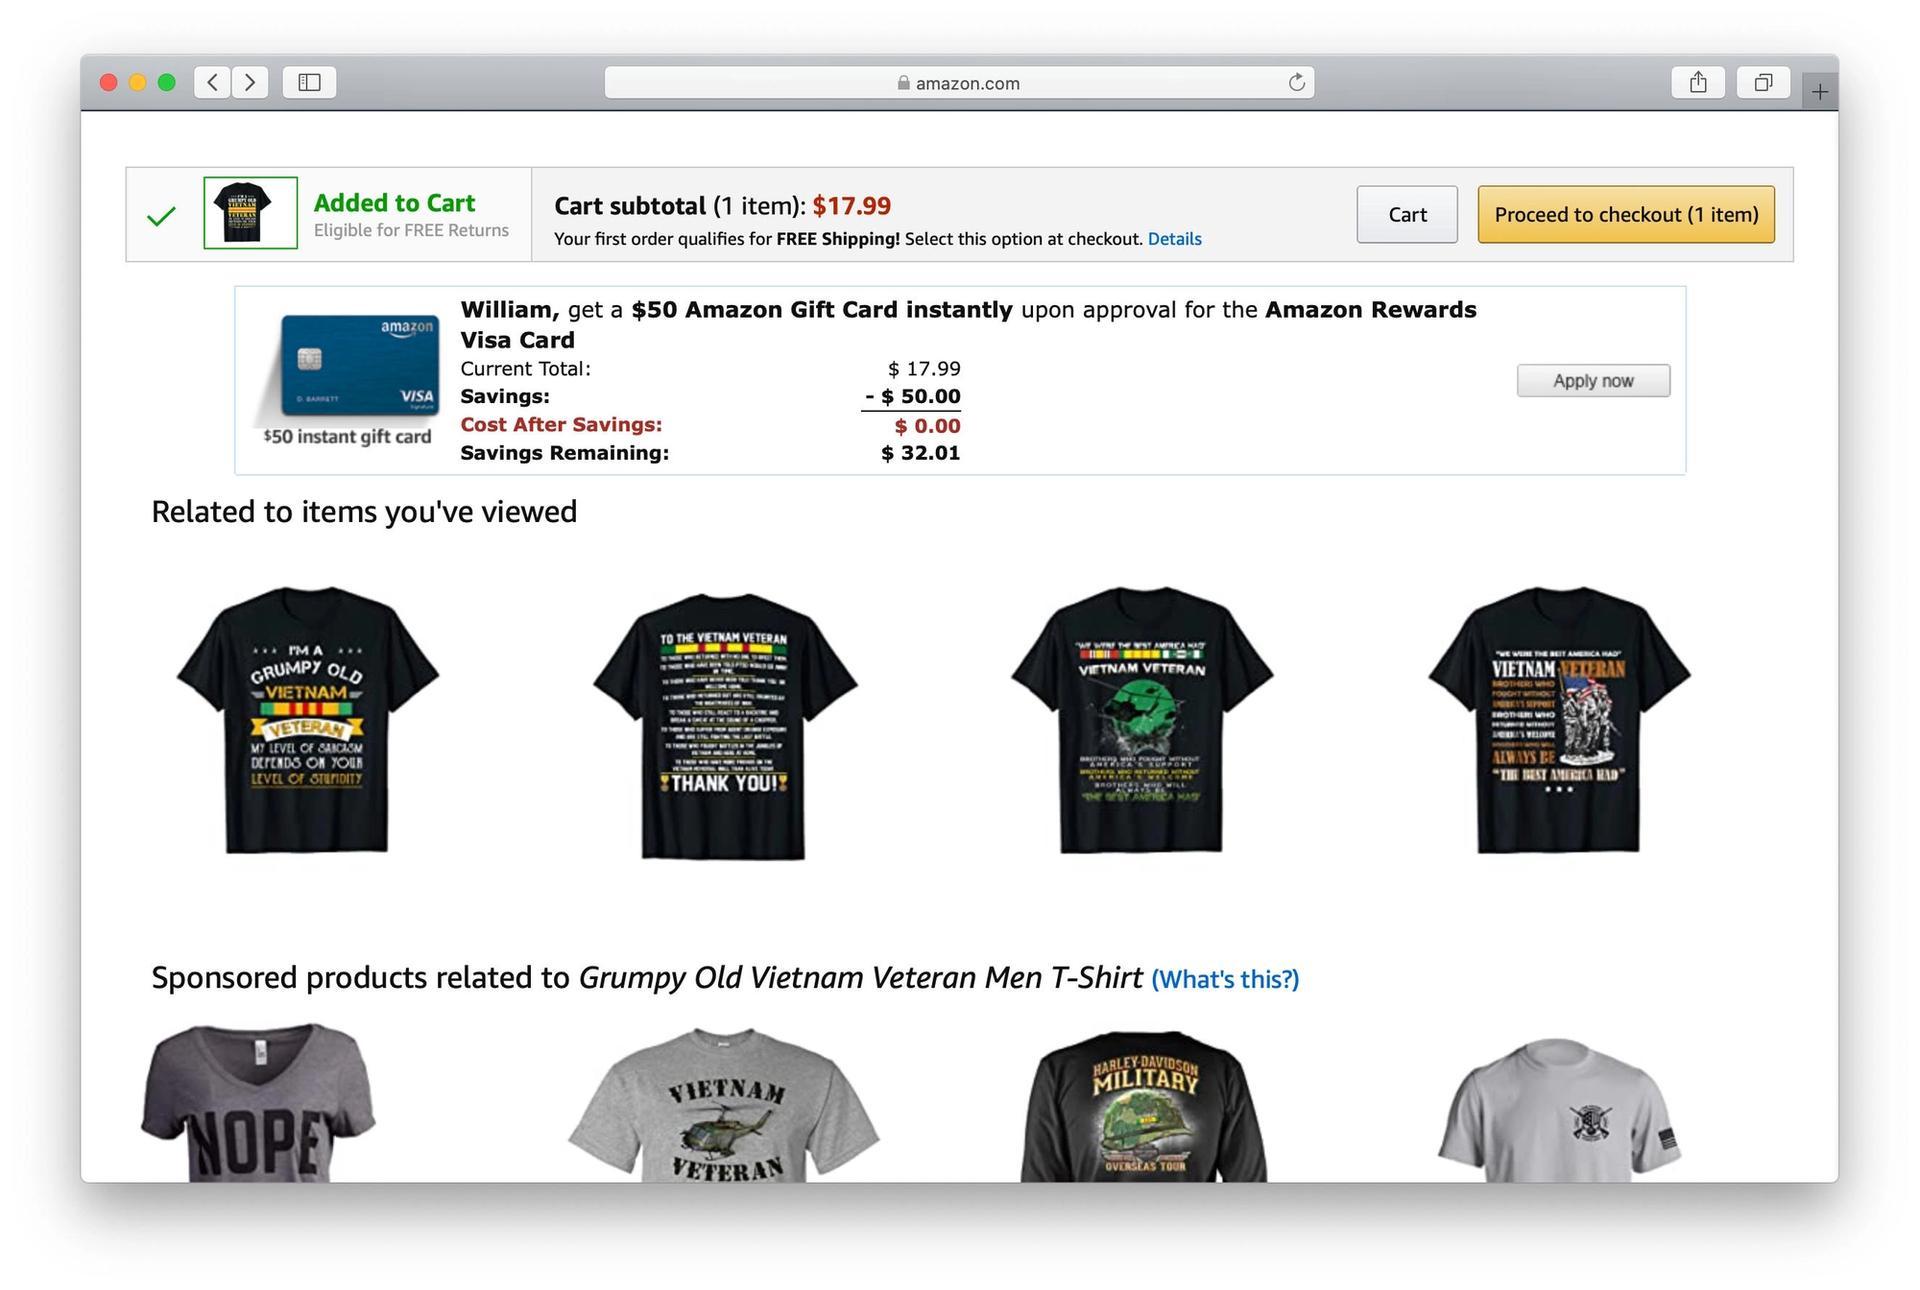 Amazon high conversion rates